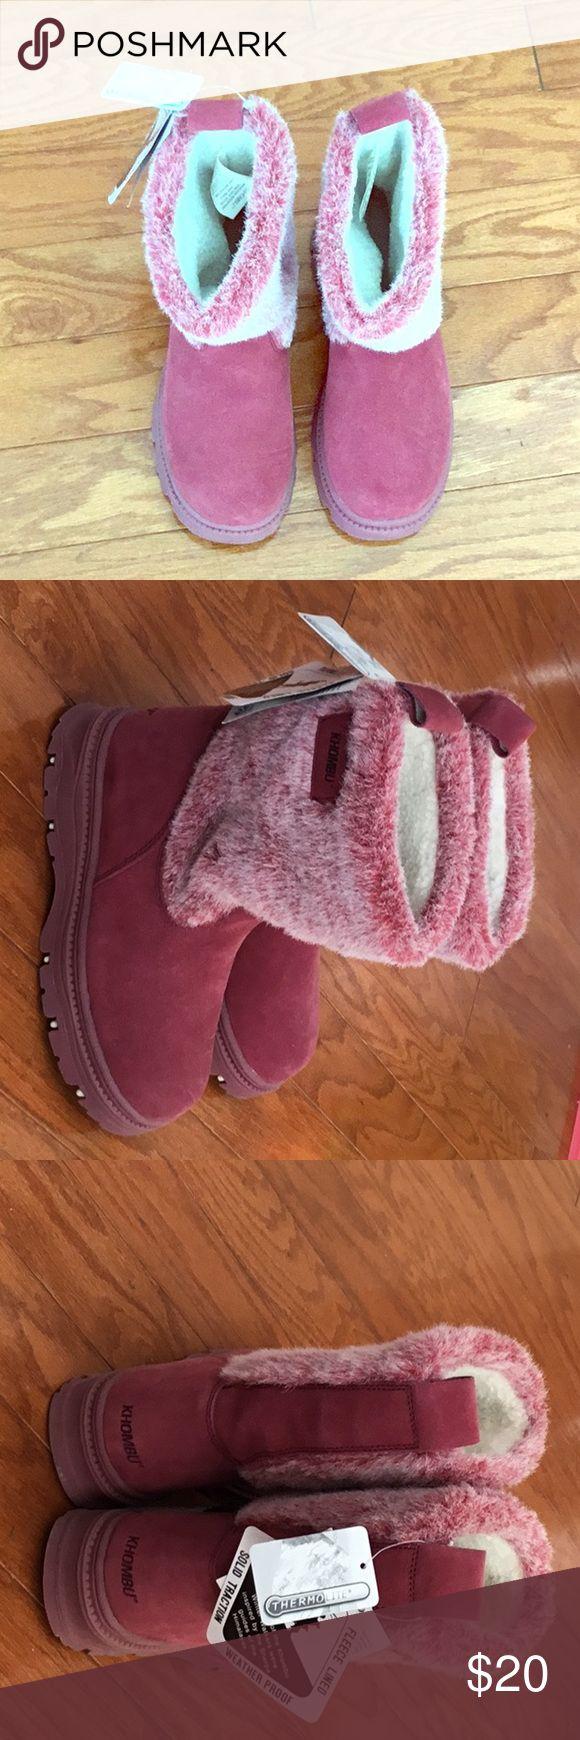 Khombu boots Khombu boots. Brand new with tags Khombu Shoes Winter & Rain Boots